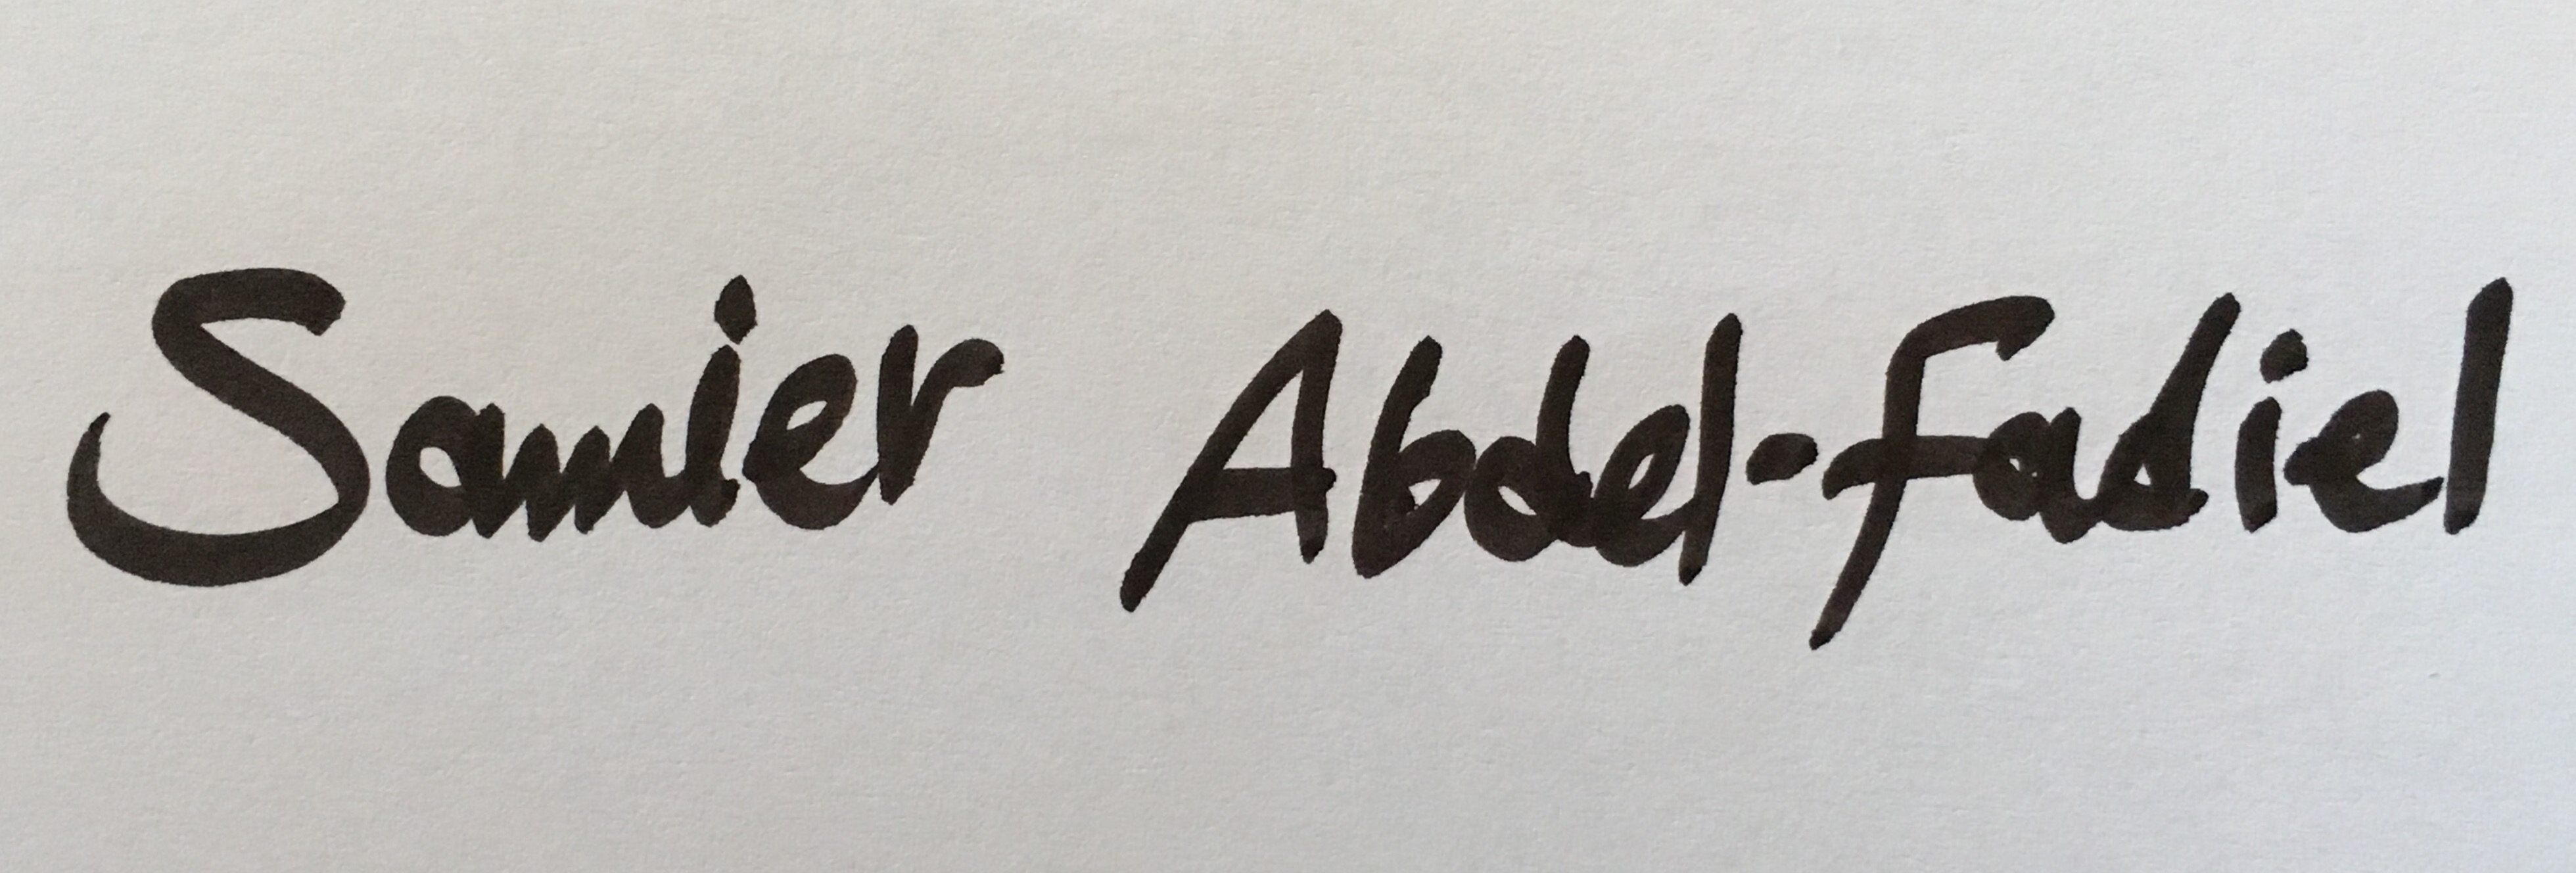 Samier abdelfadiel's Signature